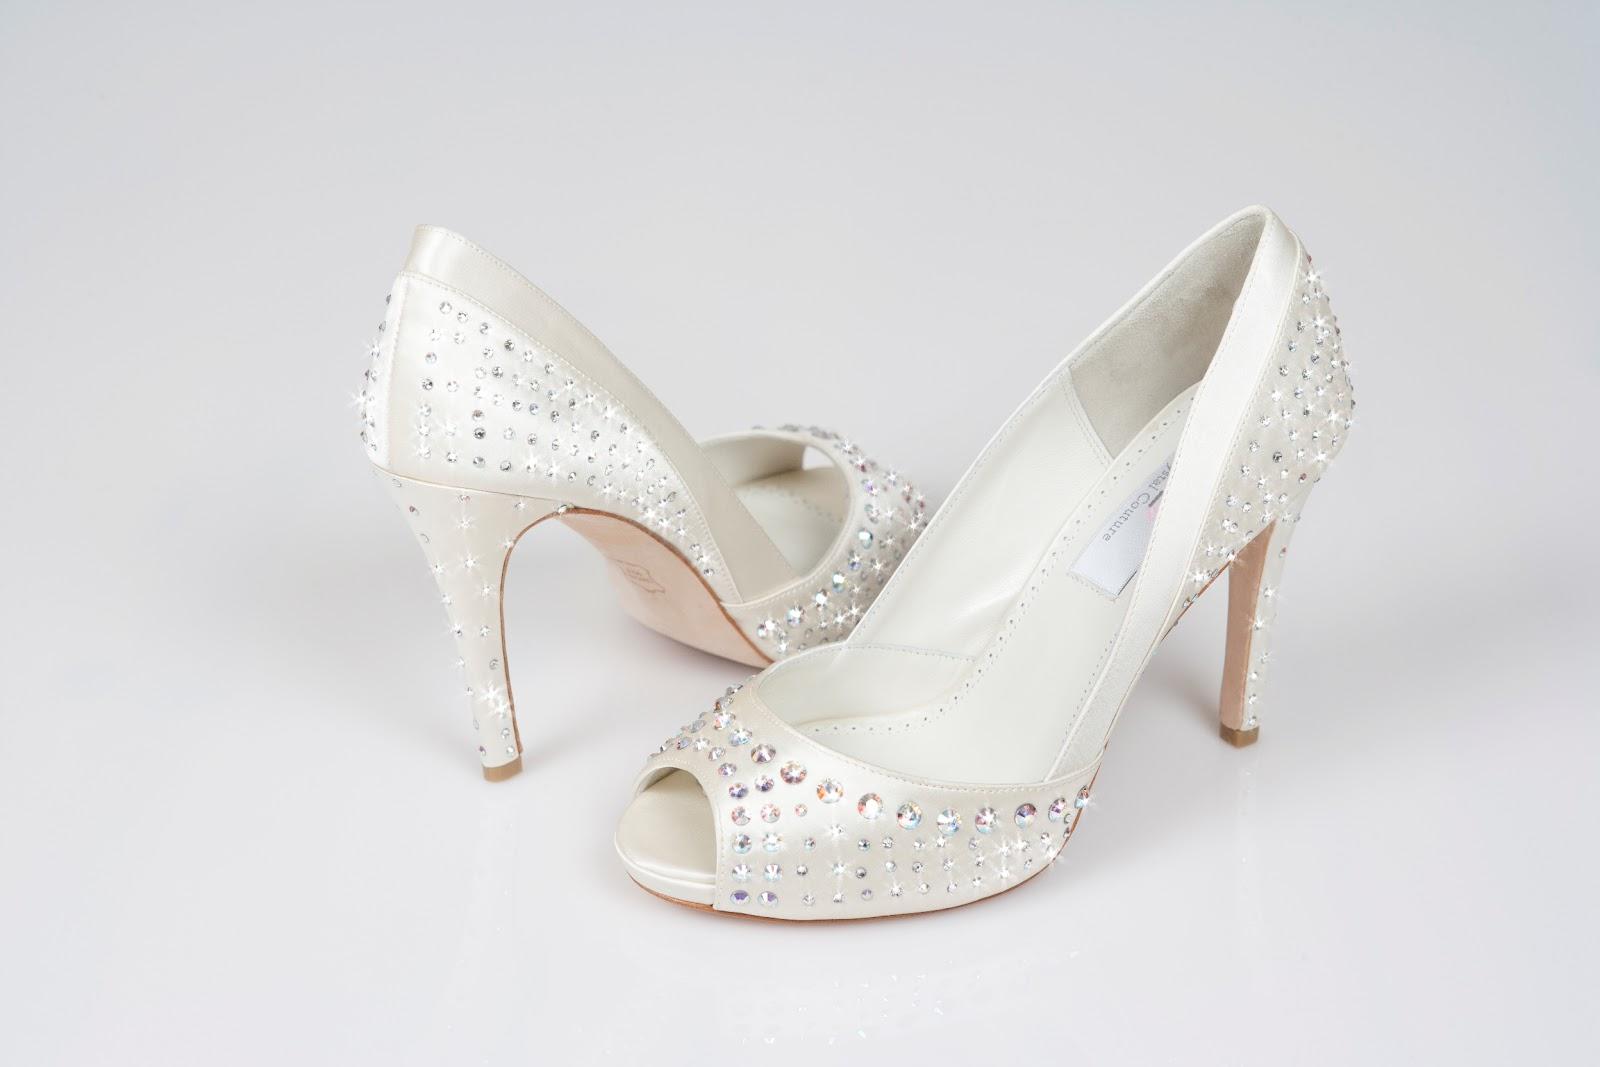 You Can Buy These Ladies Designer Luxury Swarovski Crystal High Heel  Peeptoe Wedding Shoes   Glitz U0026amp; Glamour   Online Now, With 30% Off.